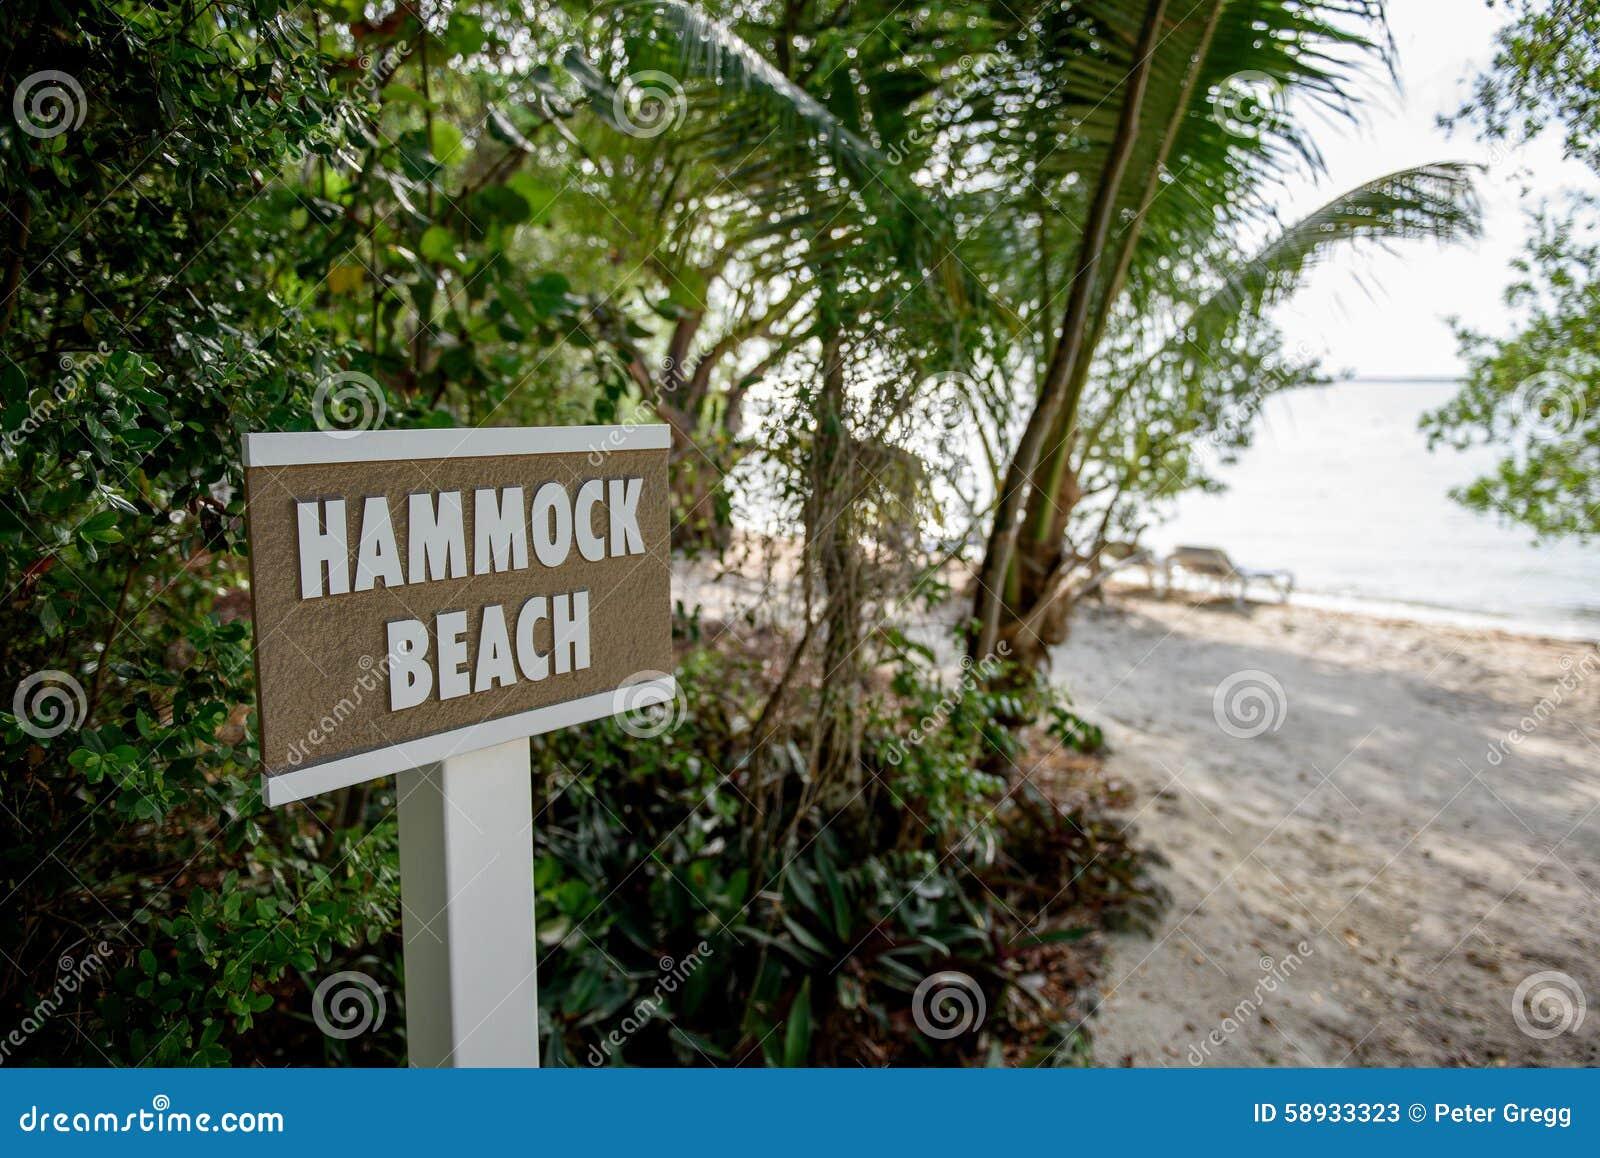 Hammock Beach sign